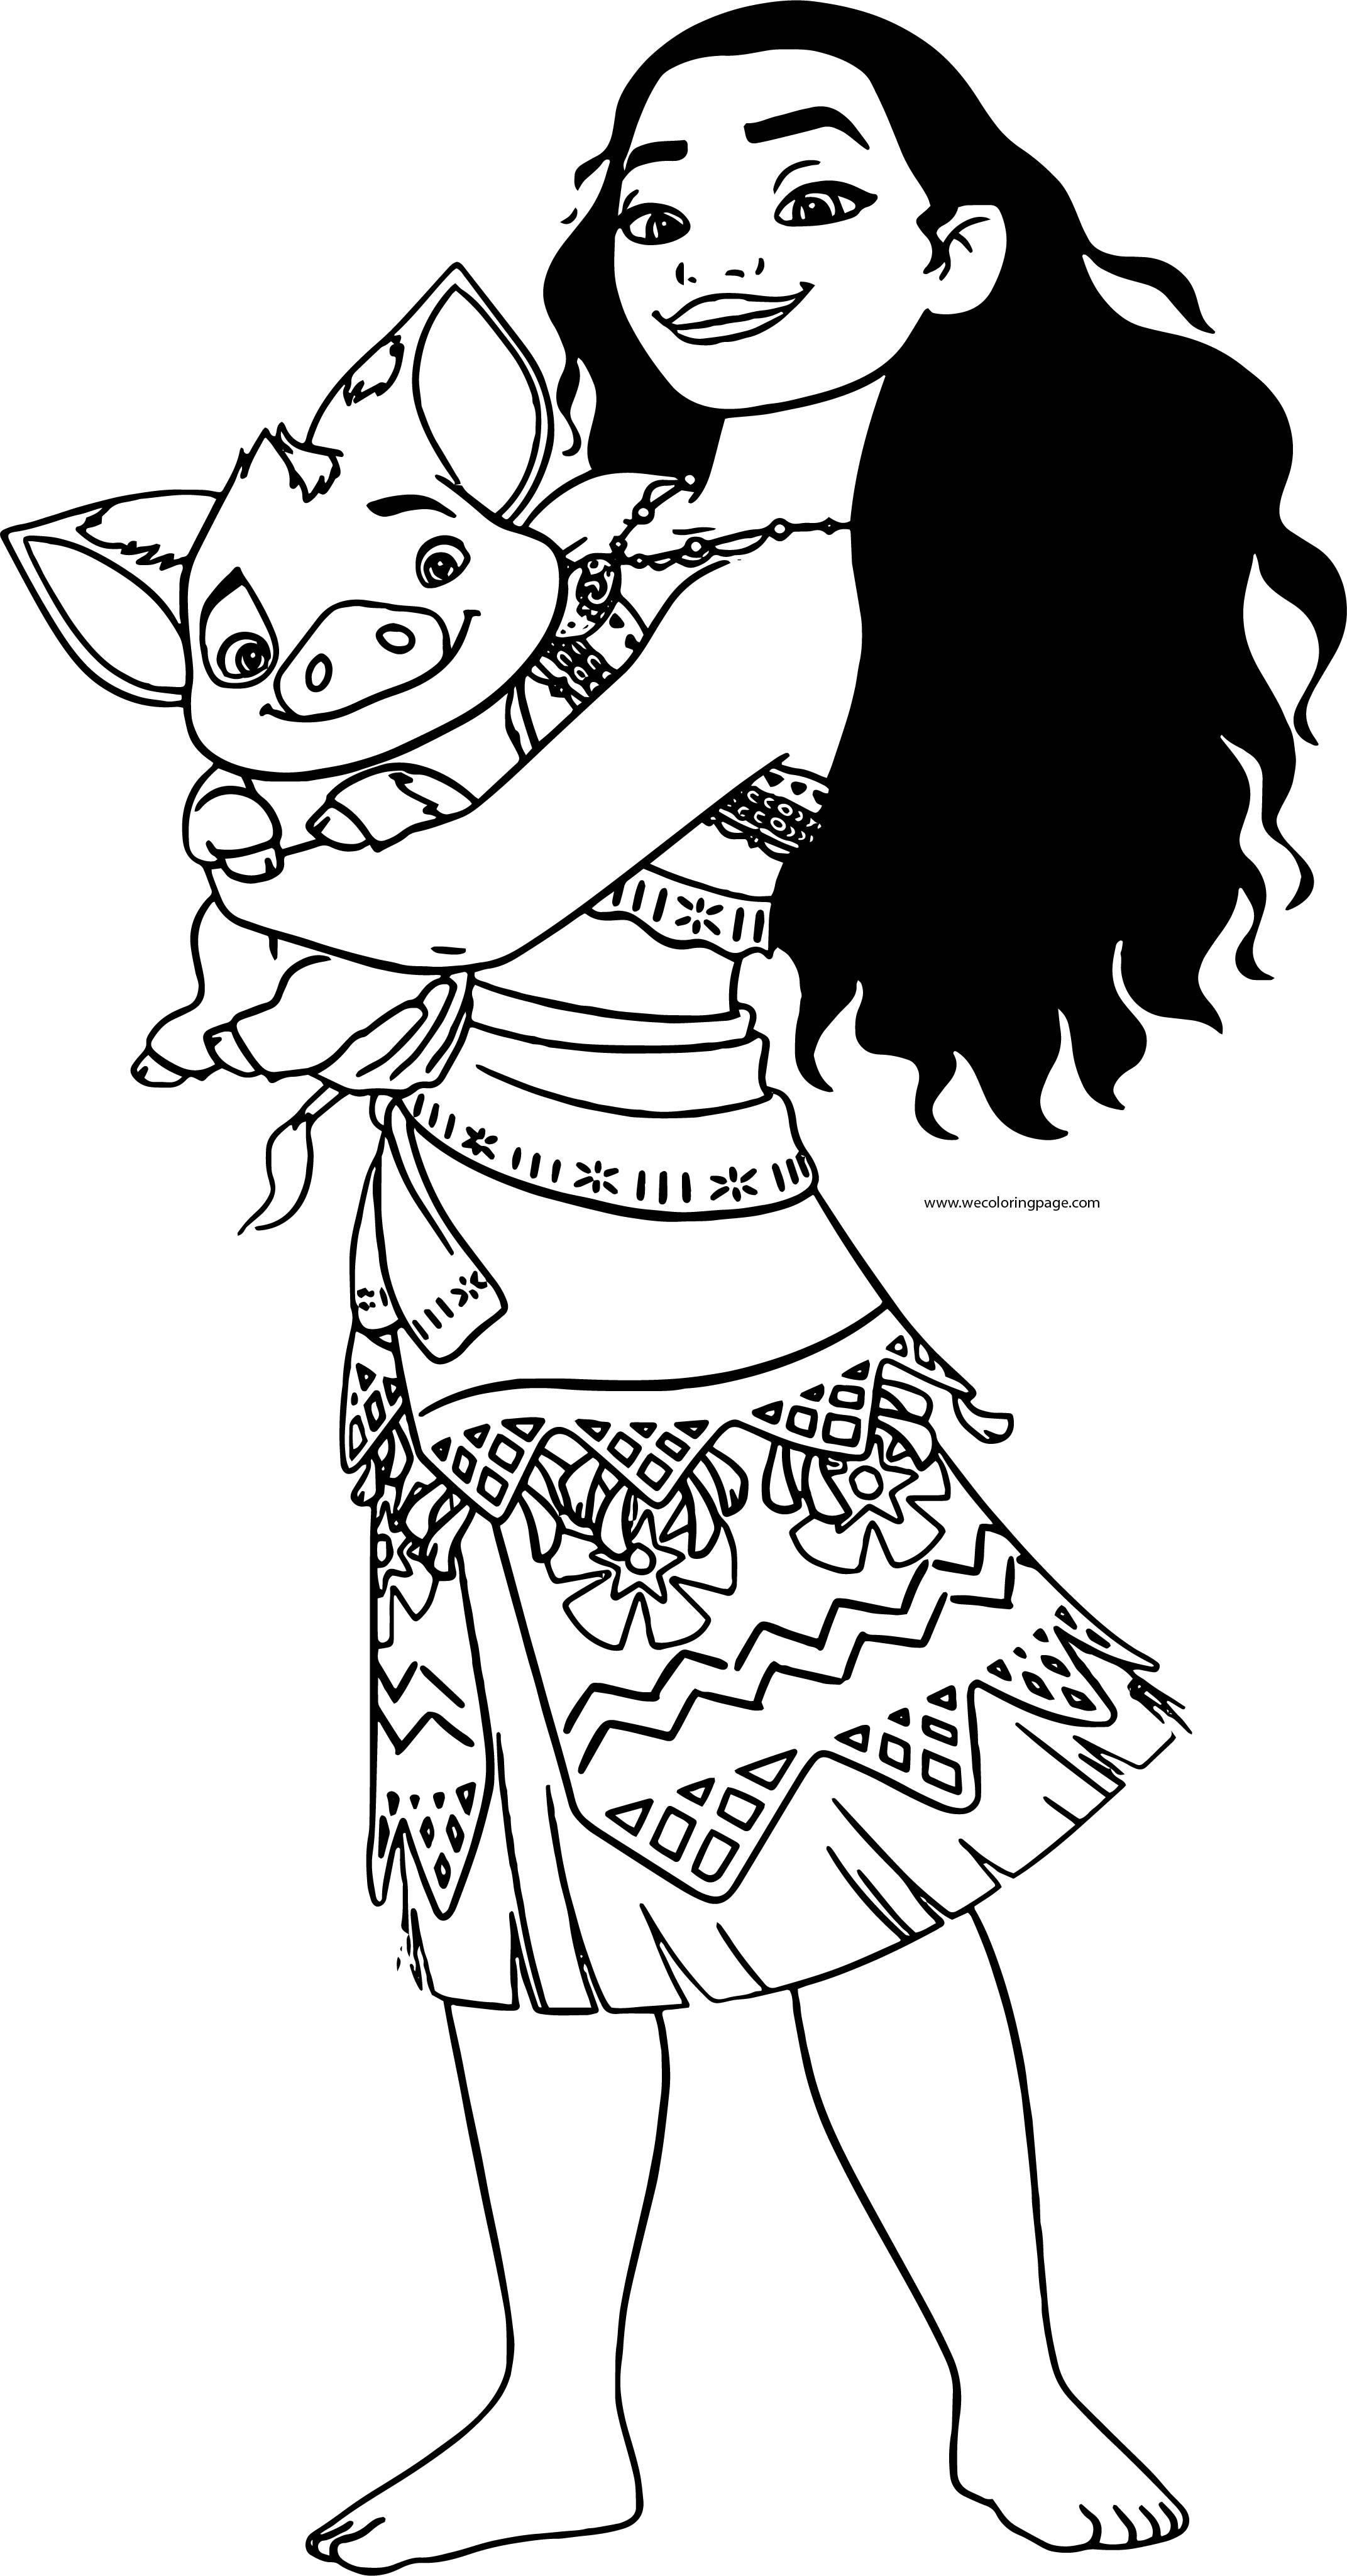 Moana Holding Pua Pig Coloring Page